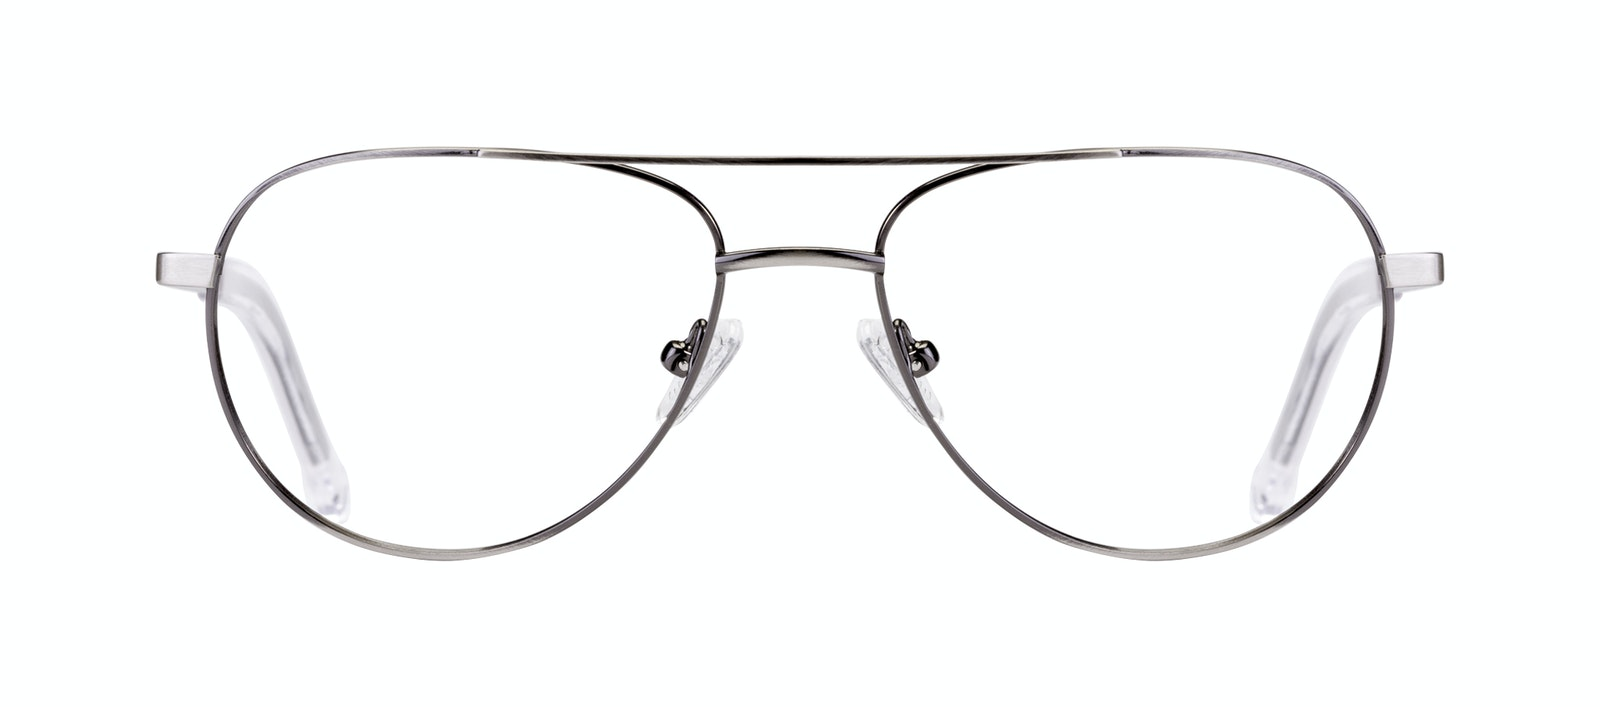 Affordable Fashion Glasses Aviator Eyeglasses Men Devoted Silver Front